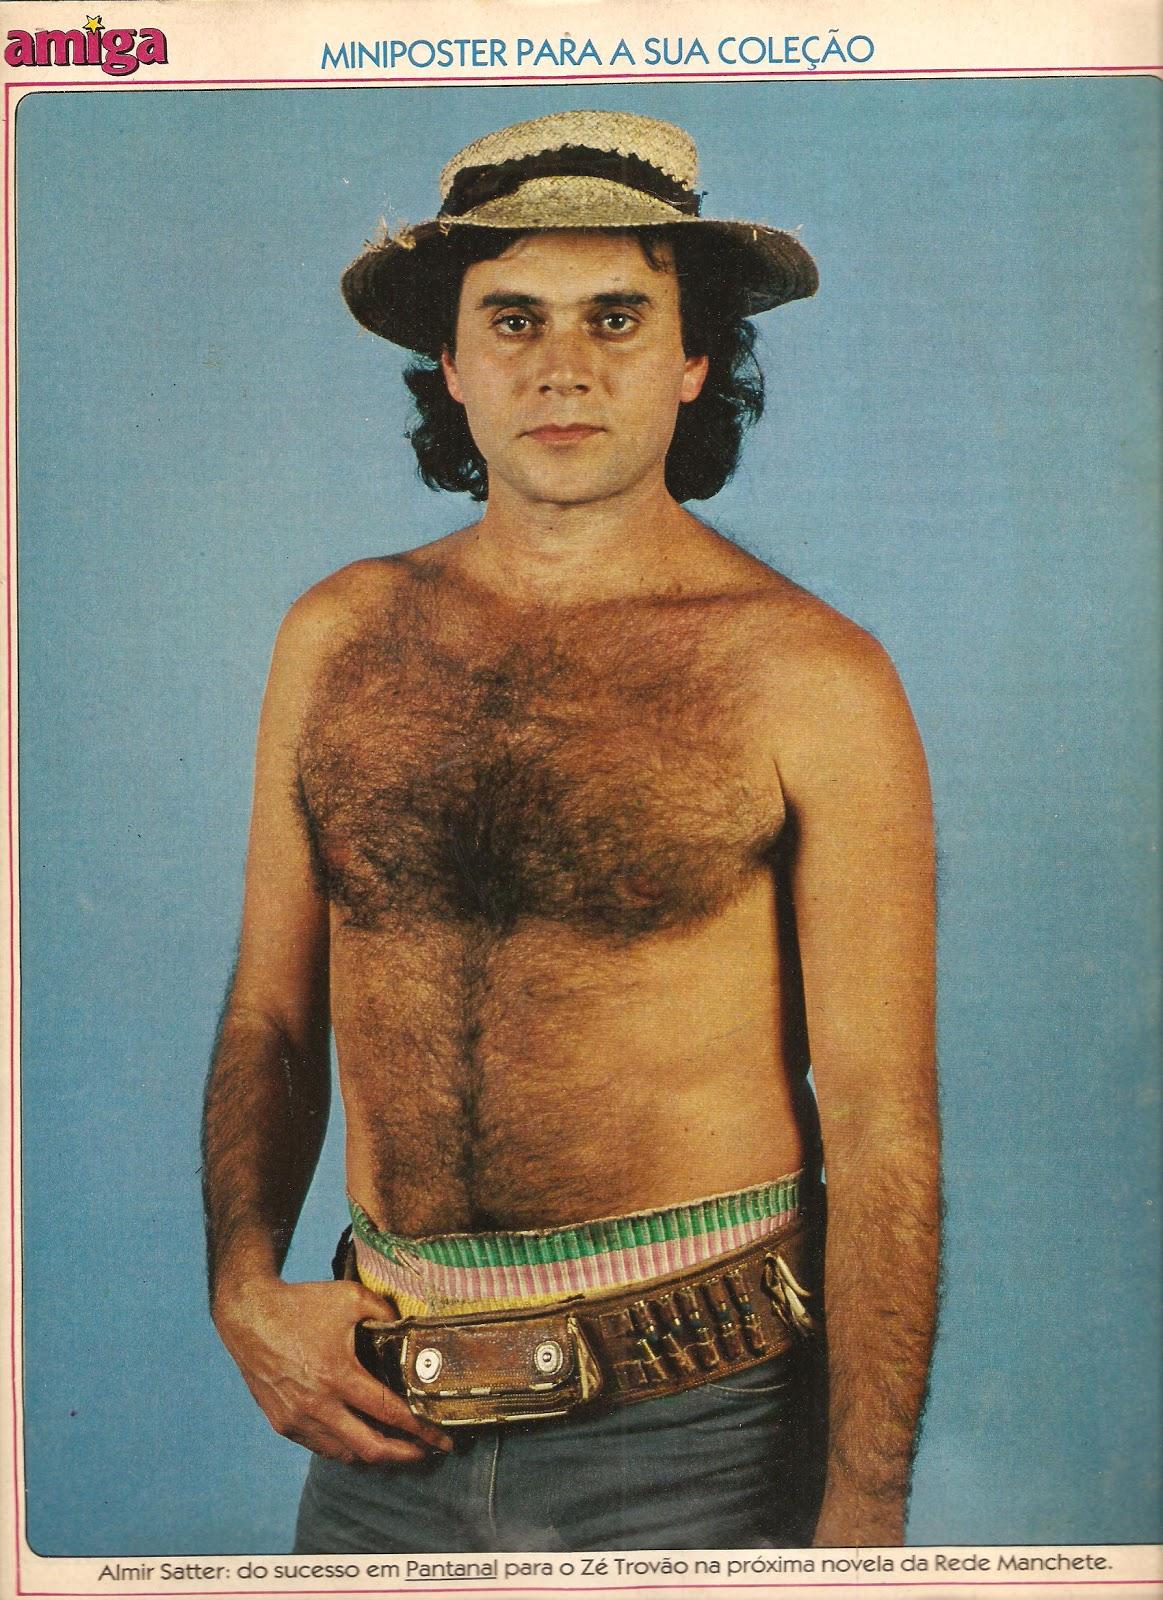 Idade Malvino Salvador Stunning revista amiga e novelas: posters e fotos